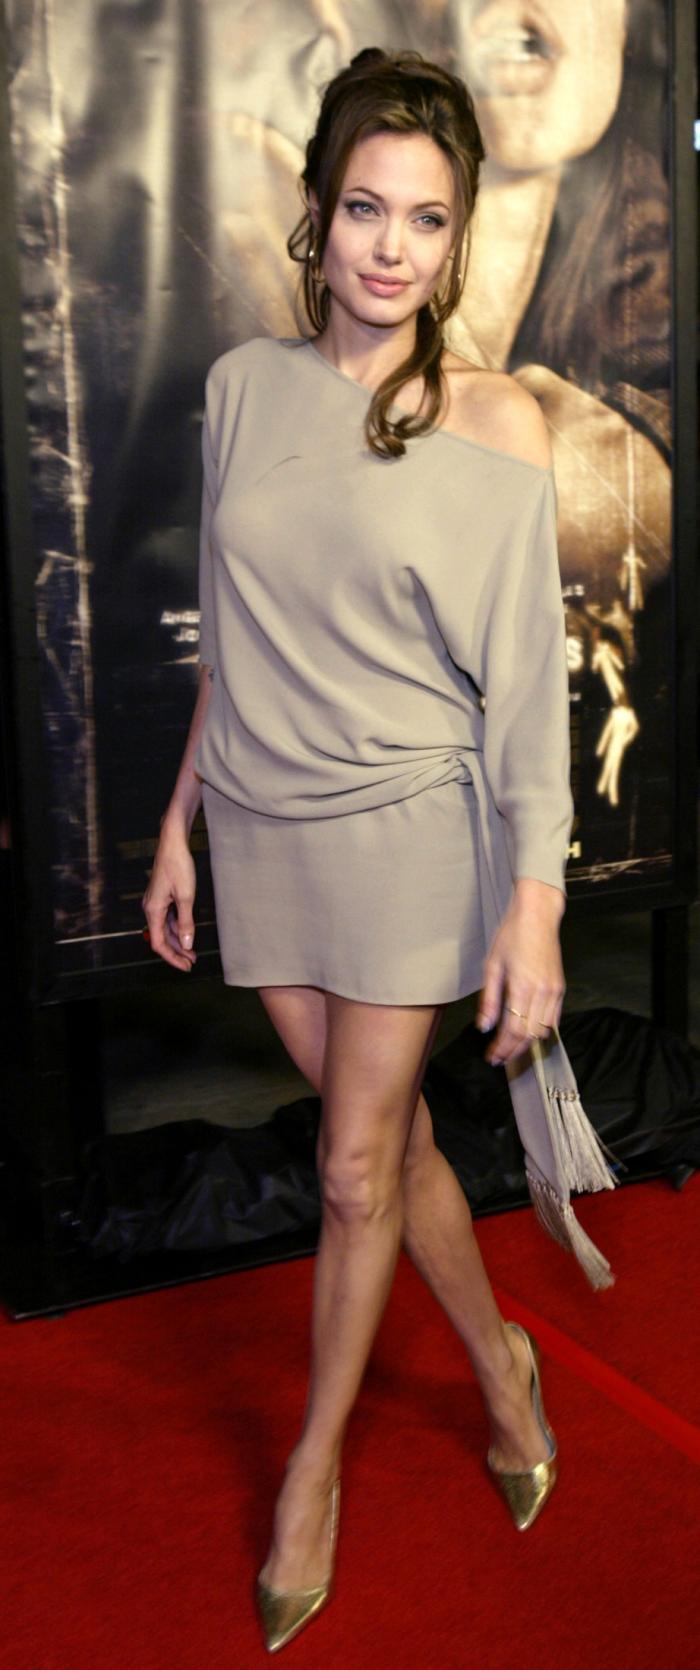 Angelina Jolie Hot Sex Scene Xnxx Com